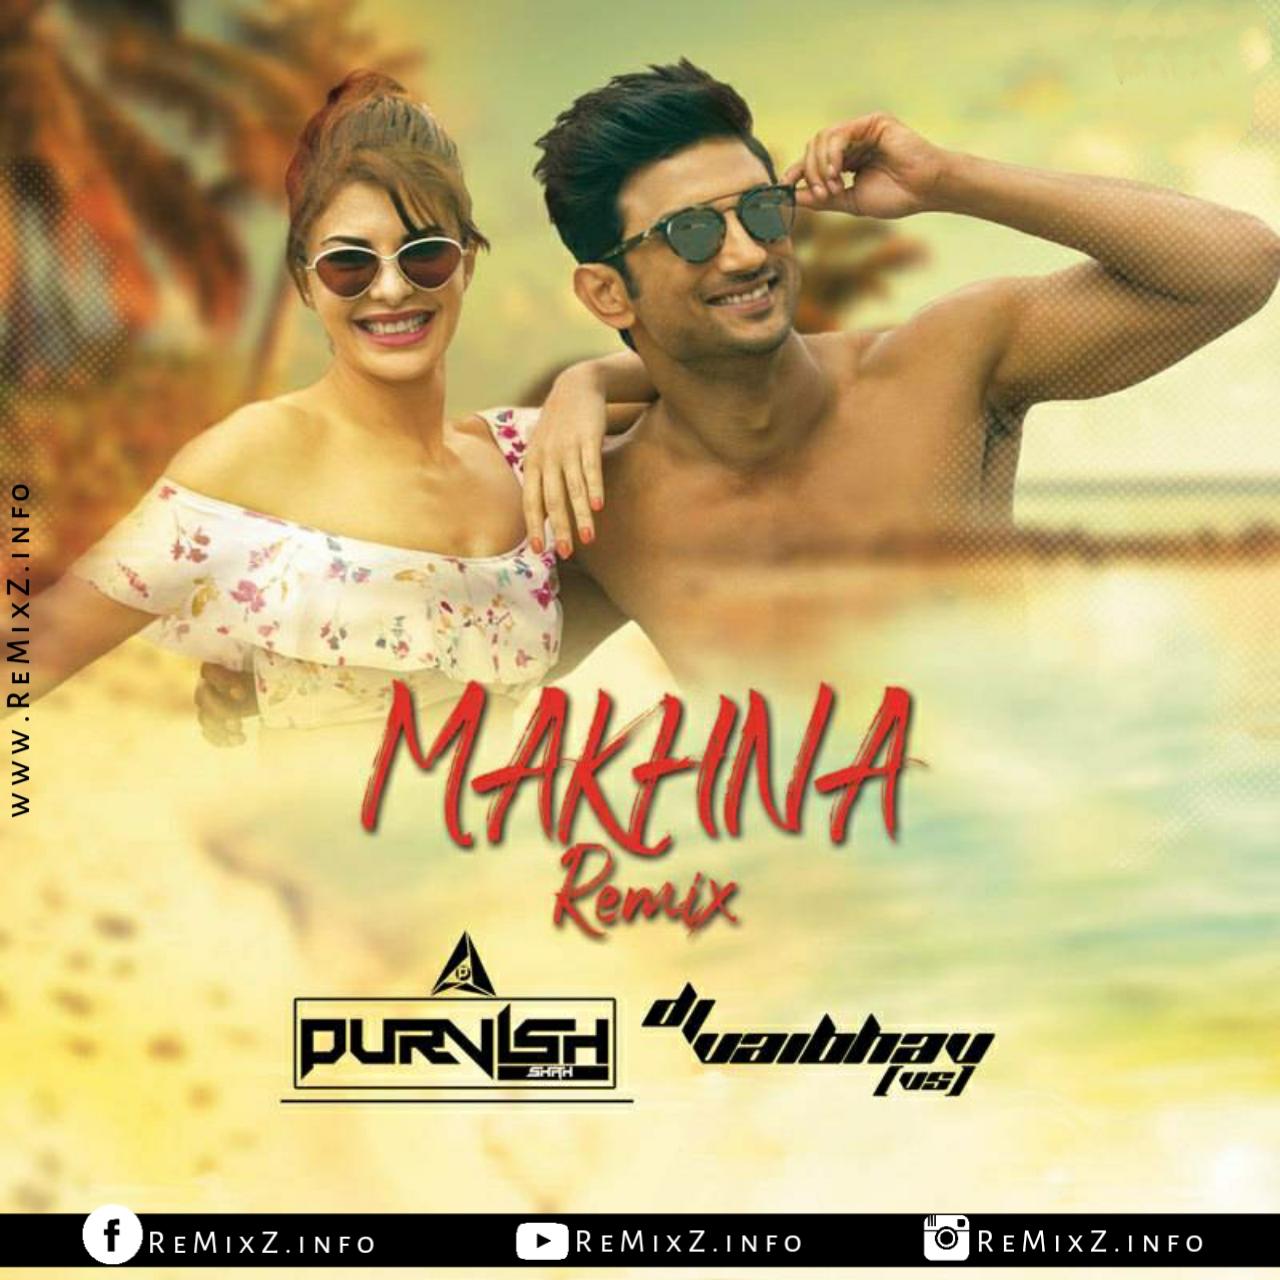 makhna-Drive-Remix-DJ-Purvish-DJ-Vaibhav-vs.jpg